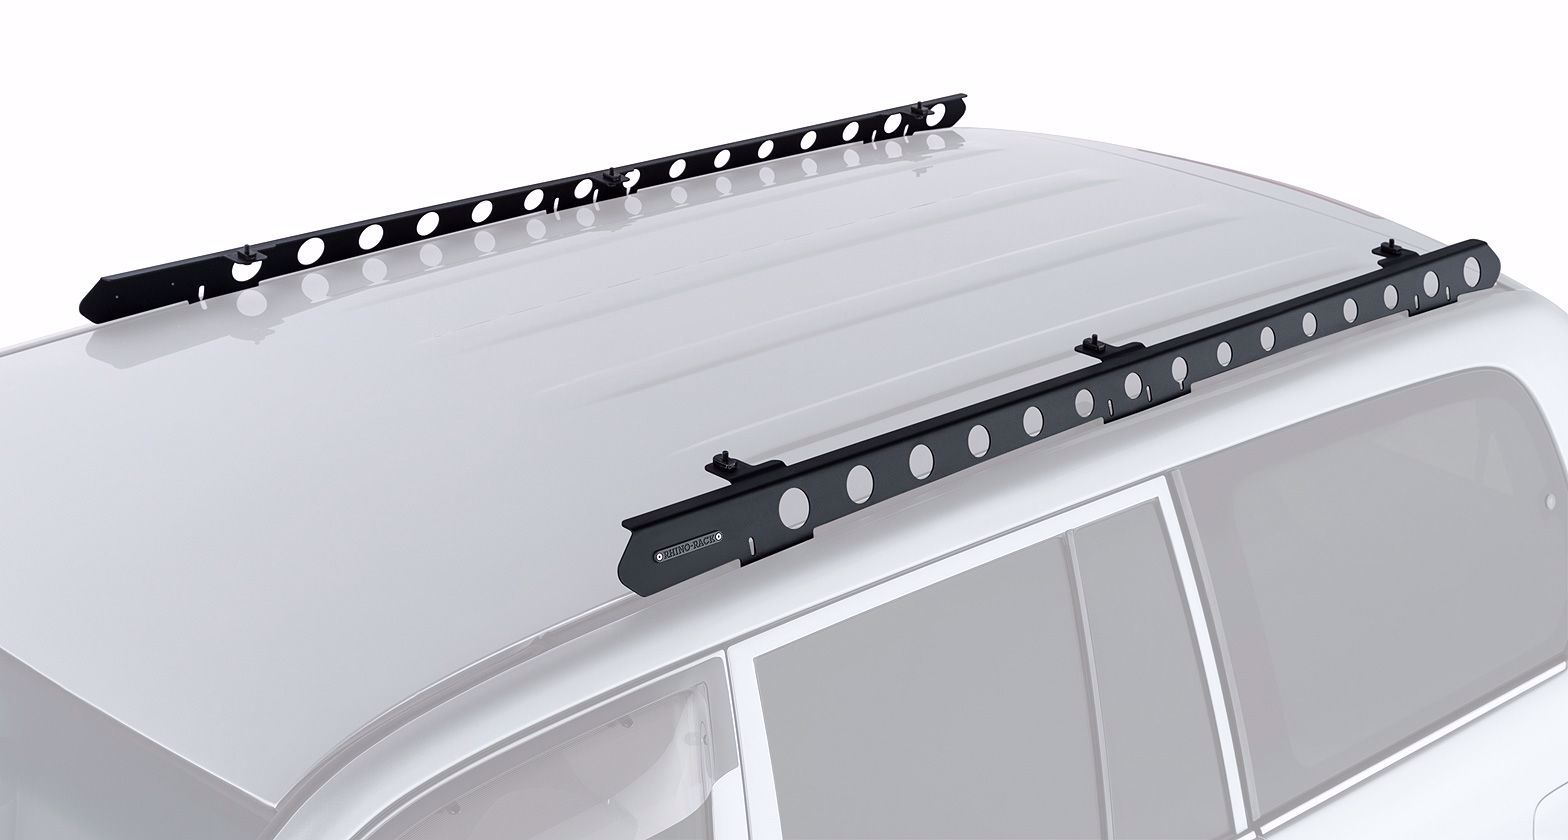 rhino rack rtlb2 100 series landcruiser backbone roof rack mounting kit